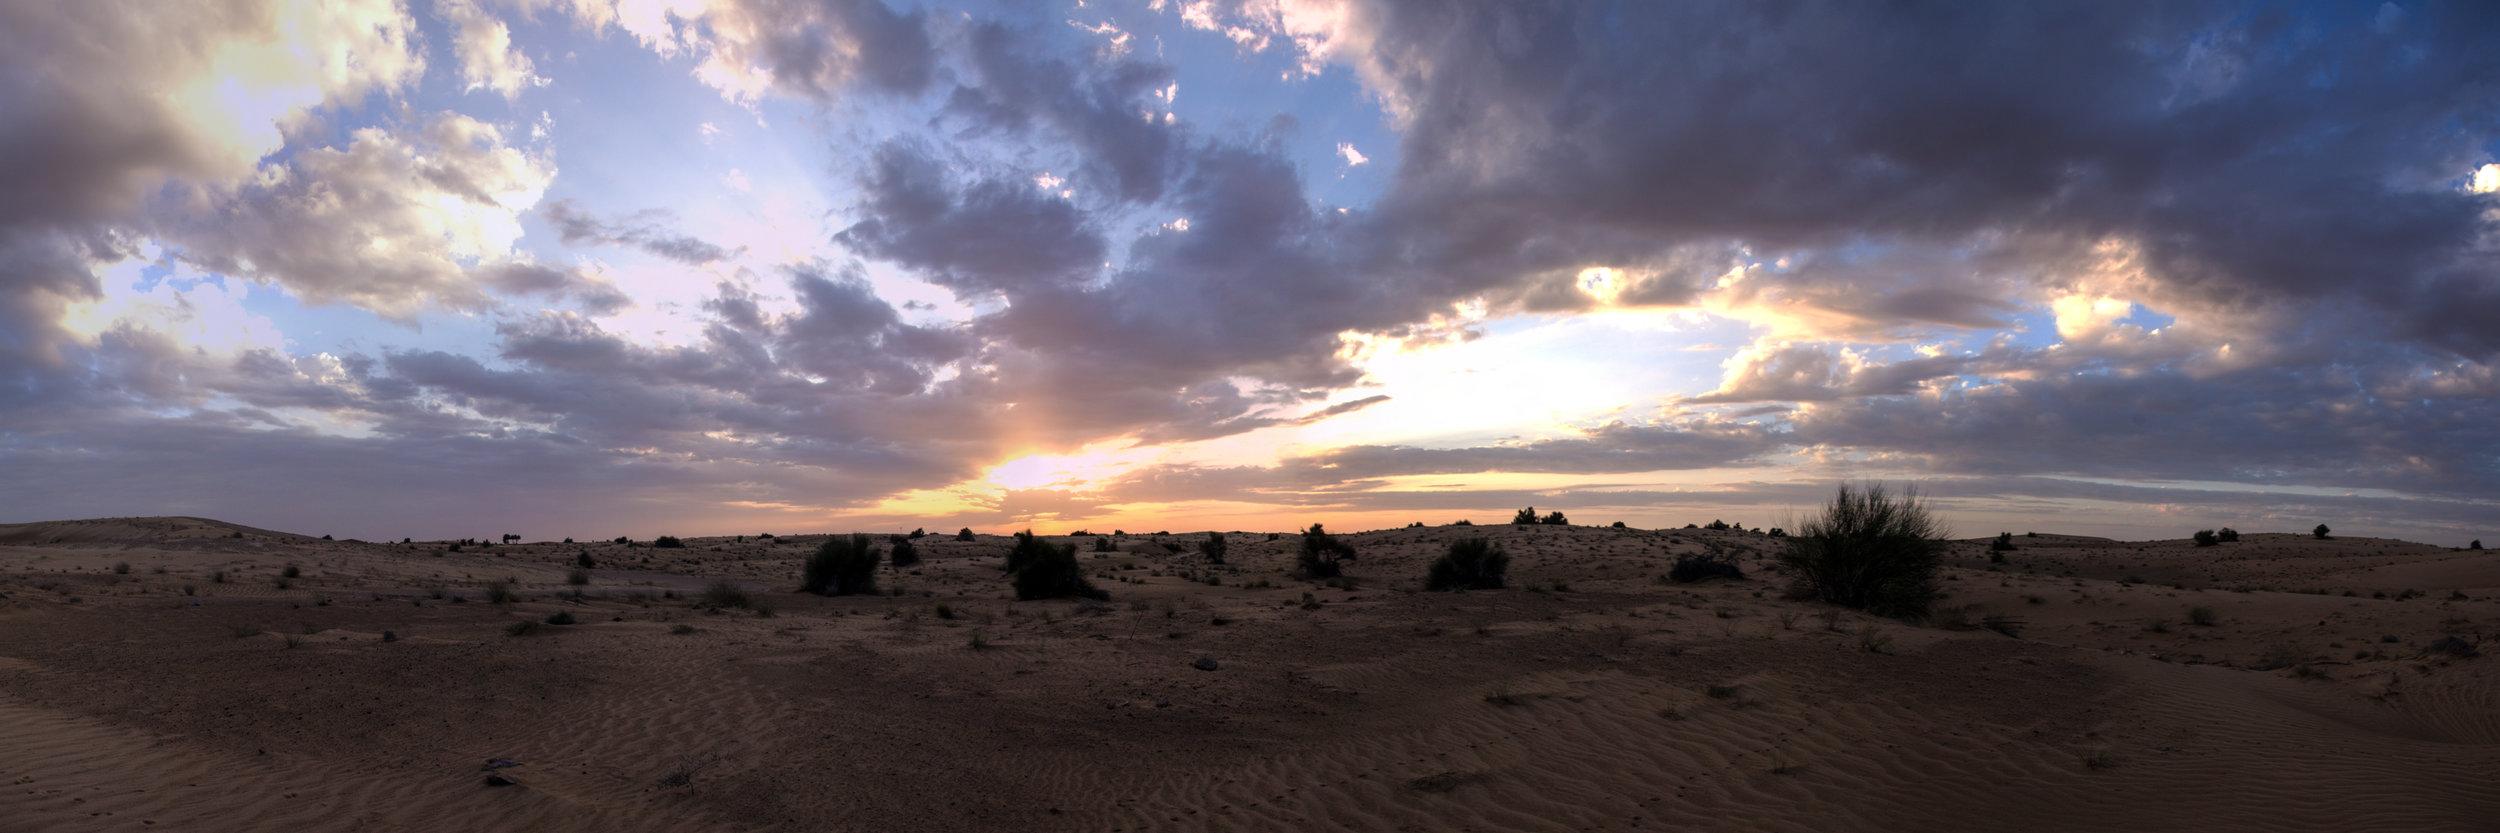 Wüste02.jpg